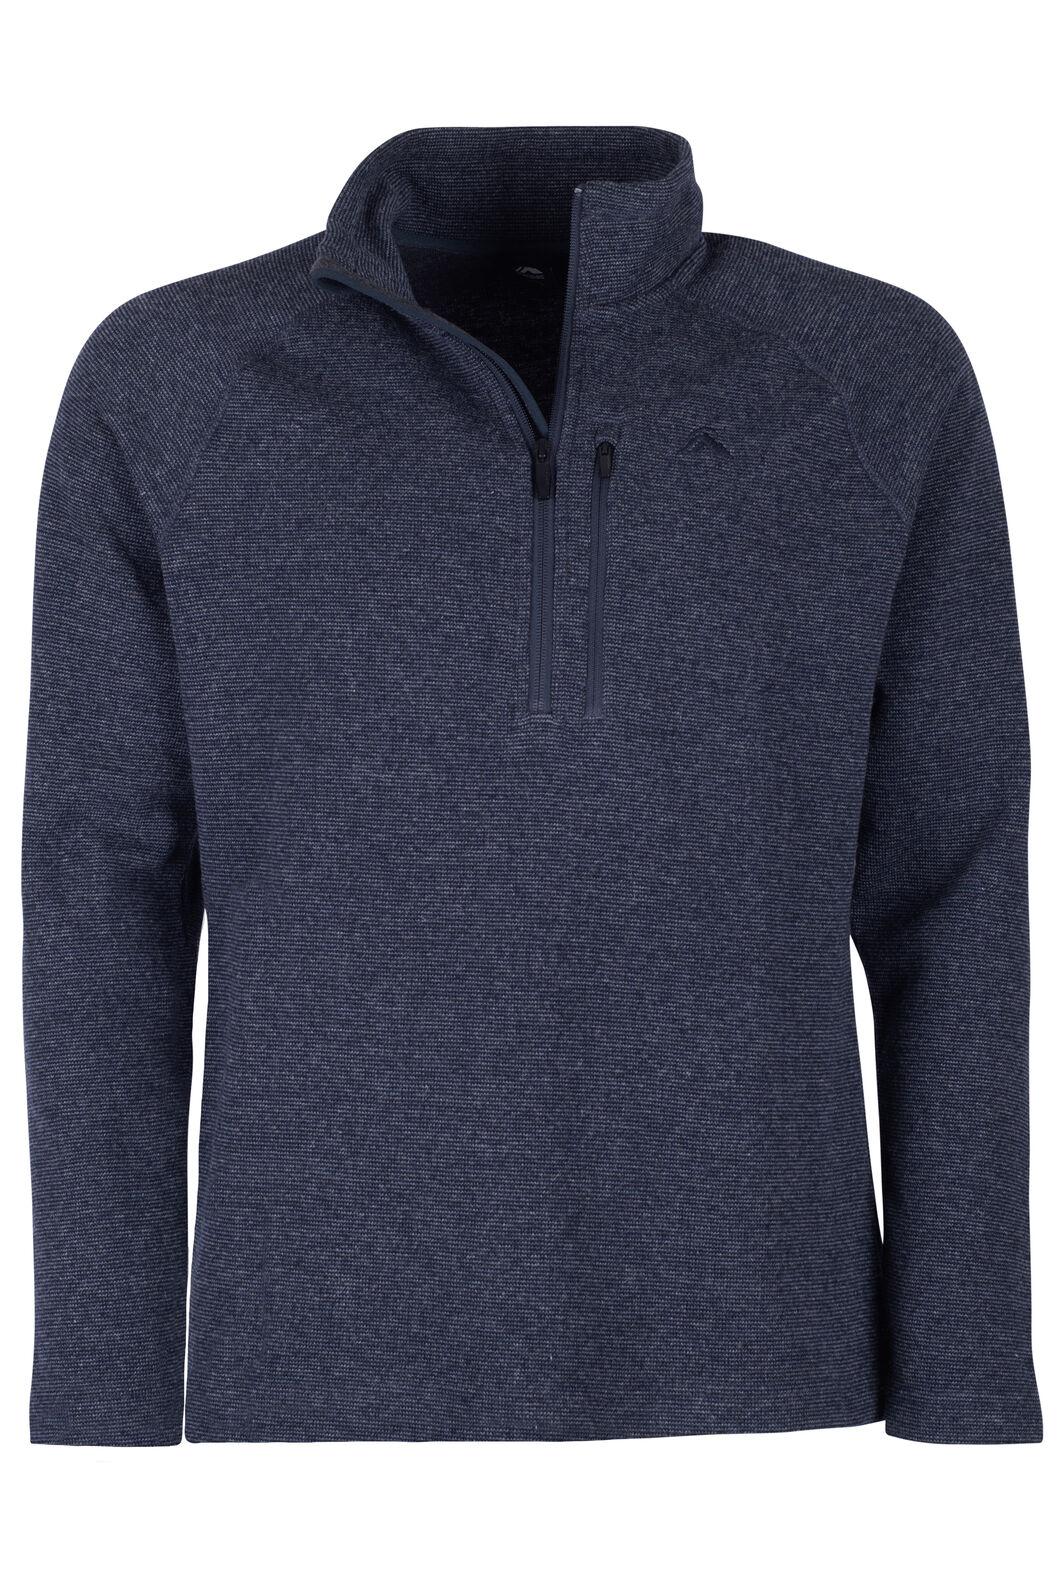 Macpac Guyon Half Zip Pullover — Men's, Navy Melange, hi-res